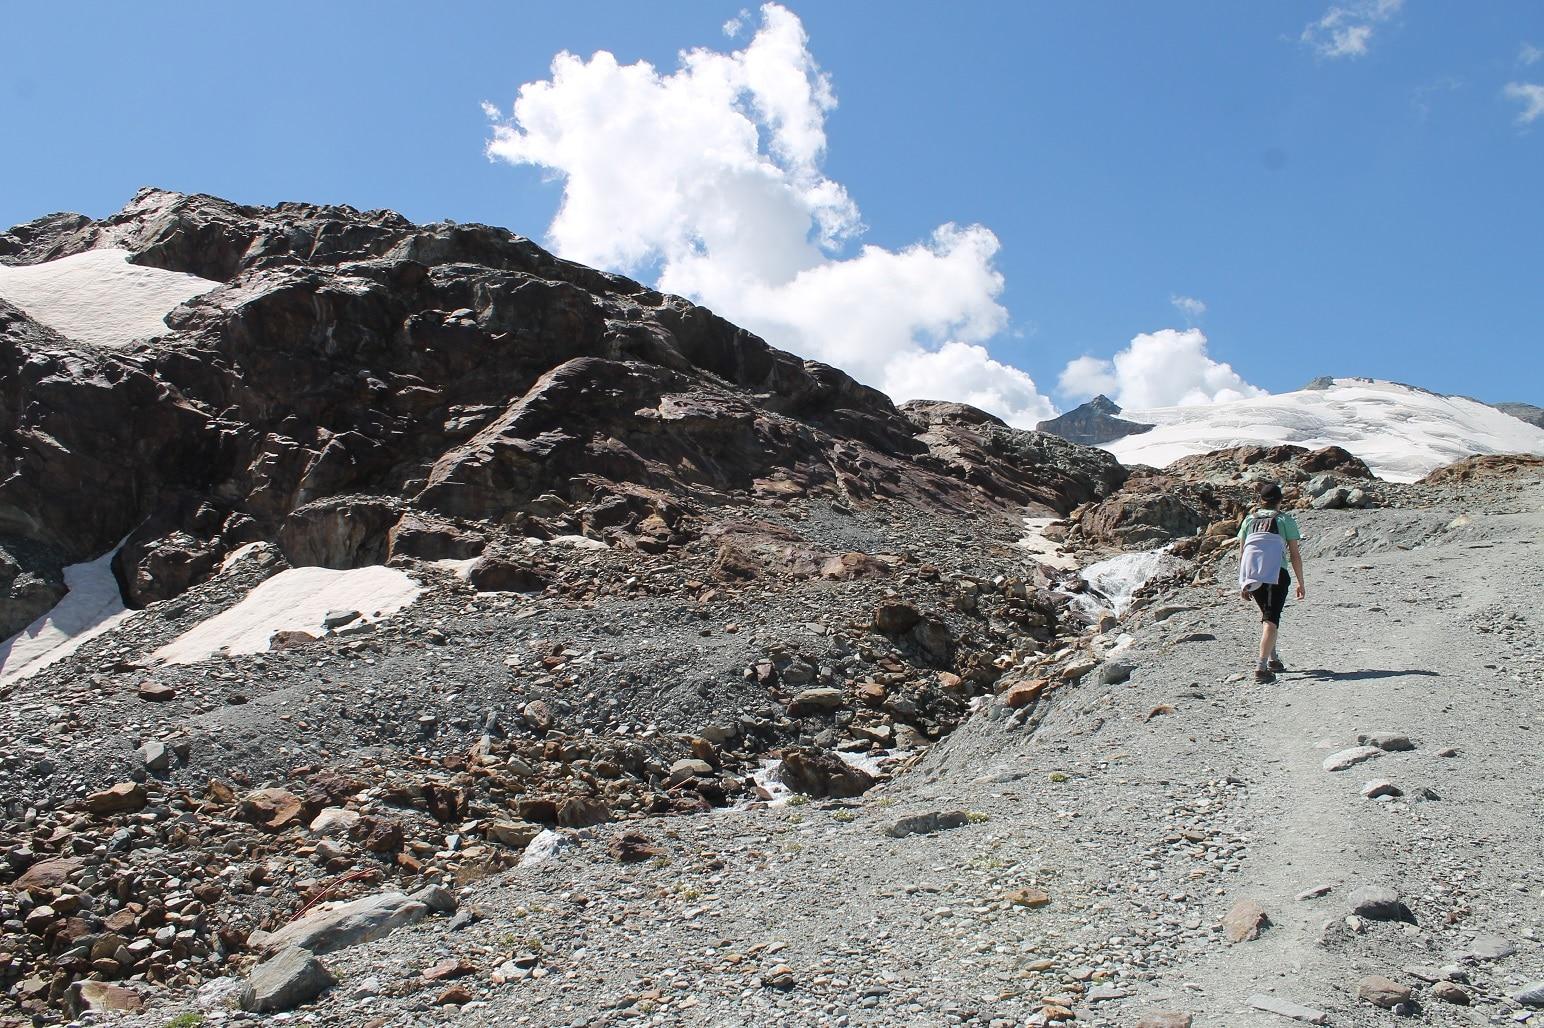 zermatt_randonnee_matterhorn_glacier_trail (4)